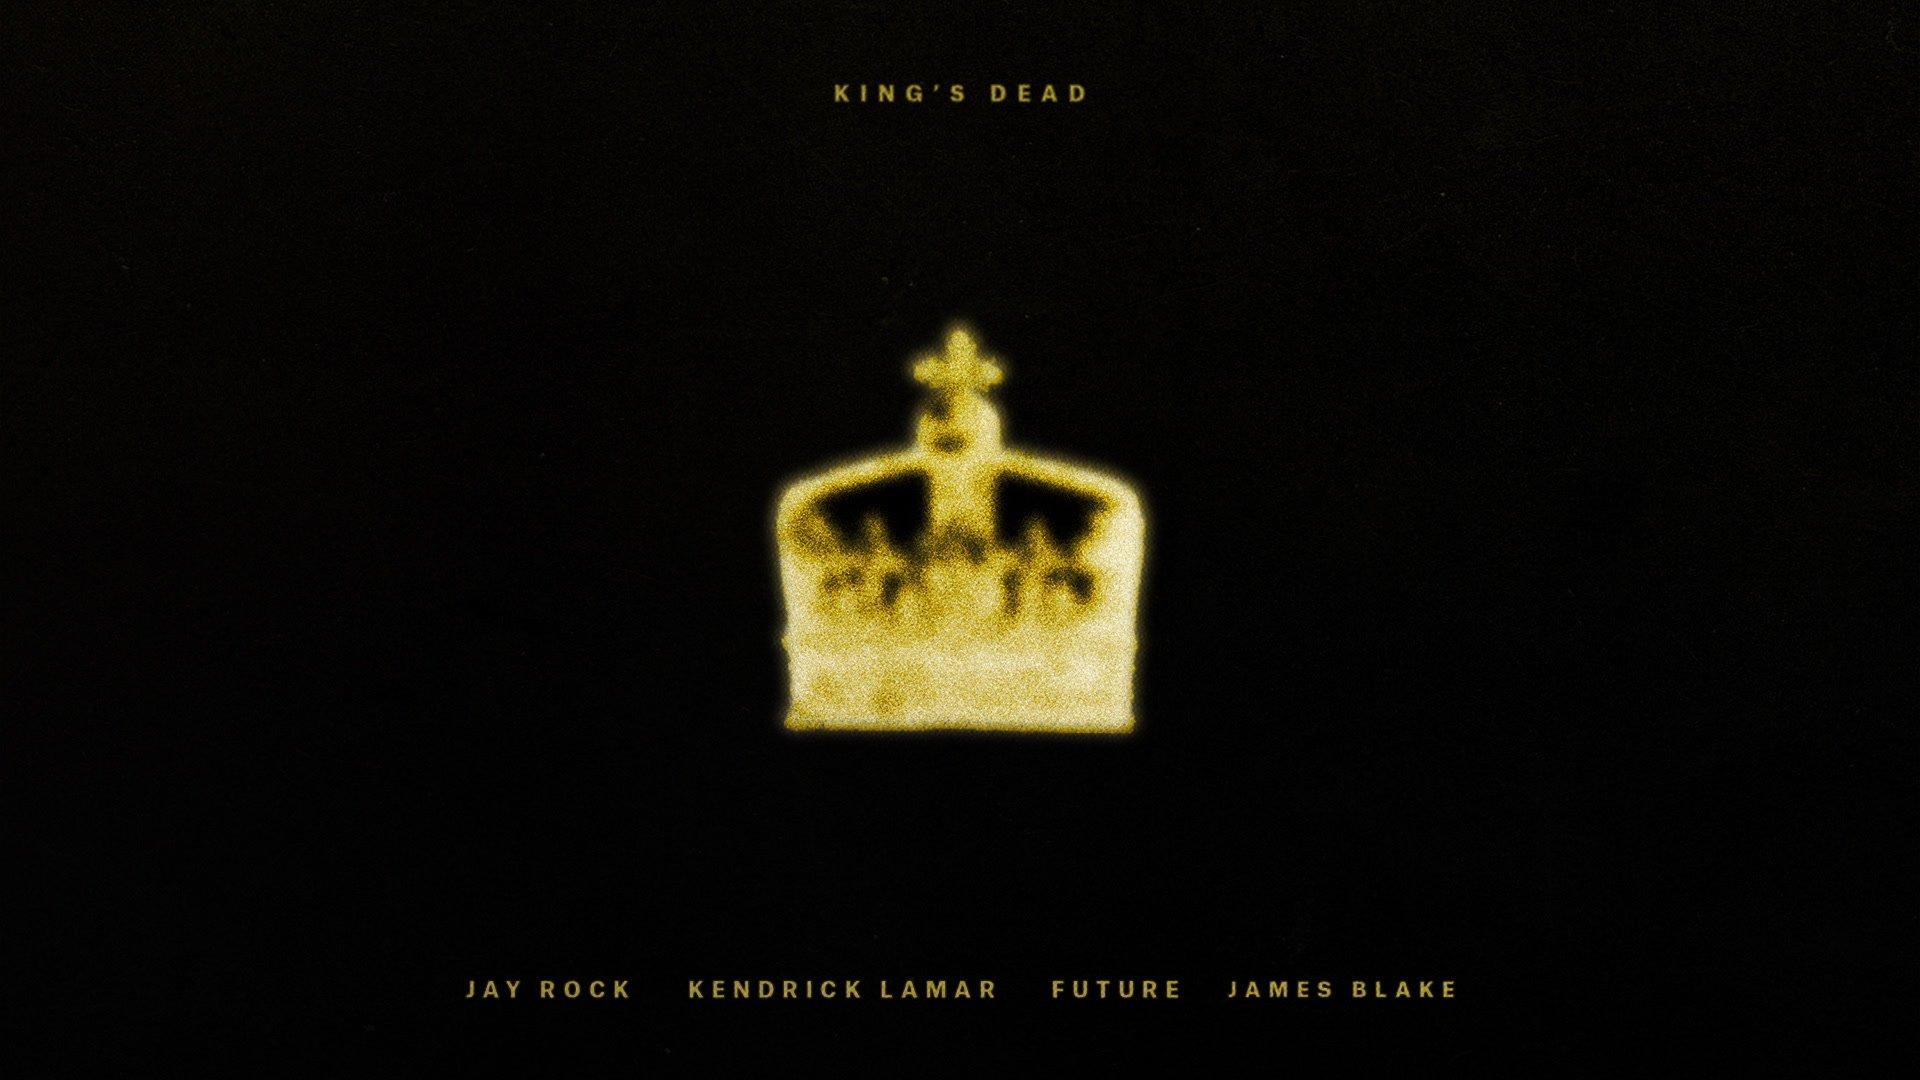 Jay Rock Kendrick Lamar Future James Blake Kings Dead